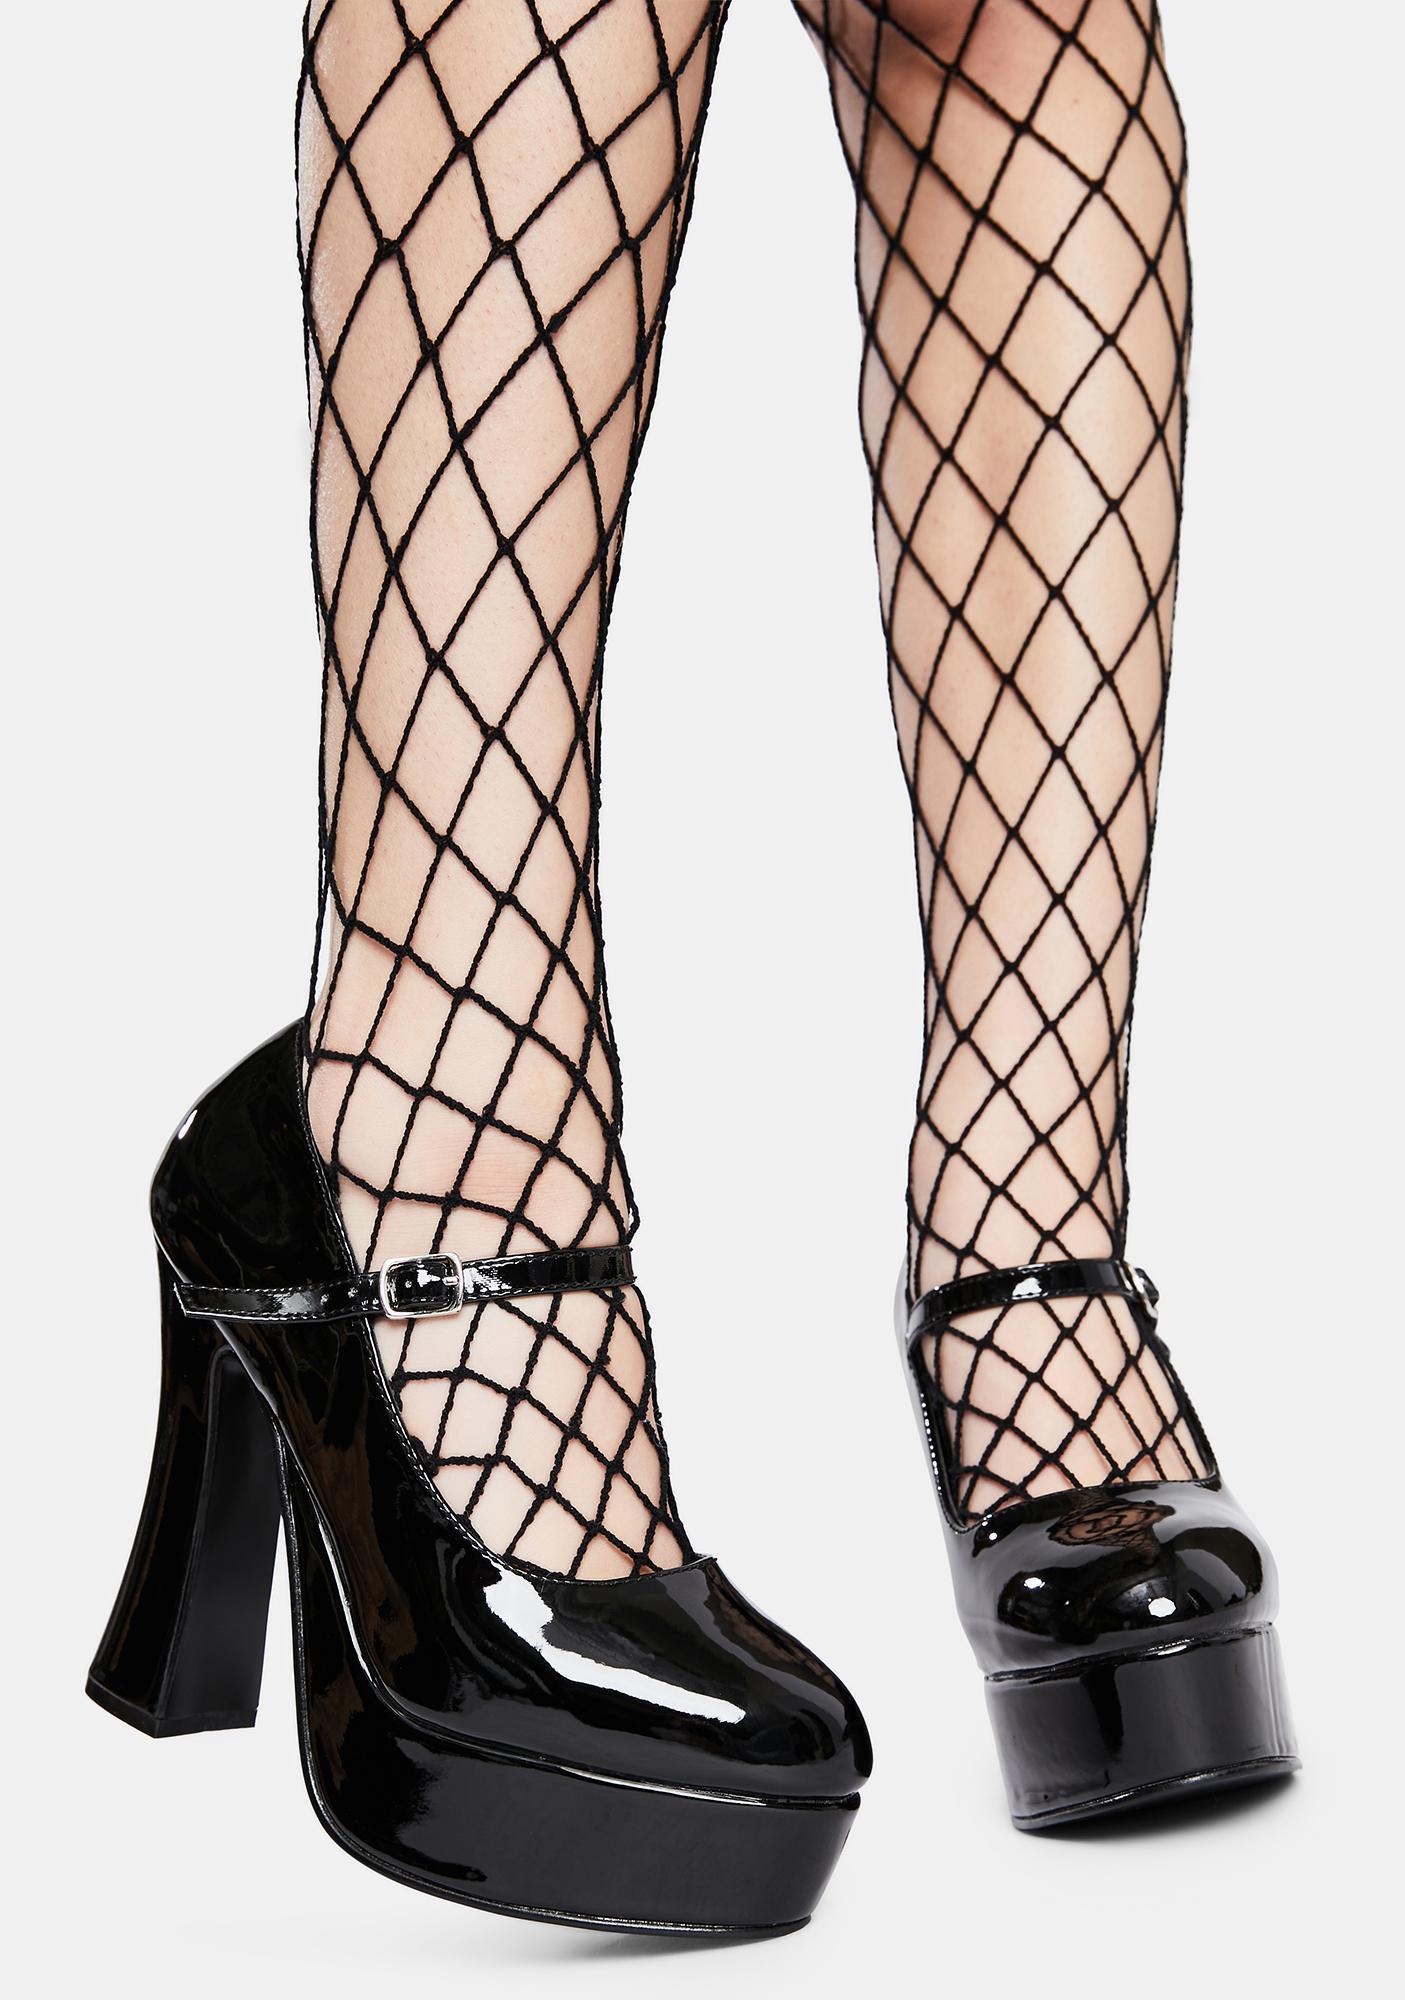 Demonia Dolly Patent Platform Heels